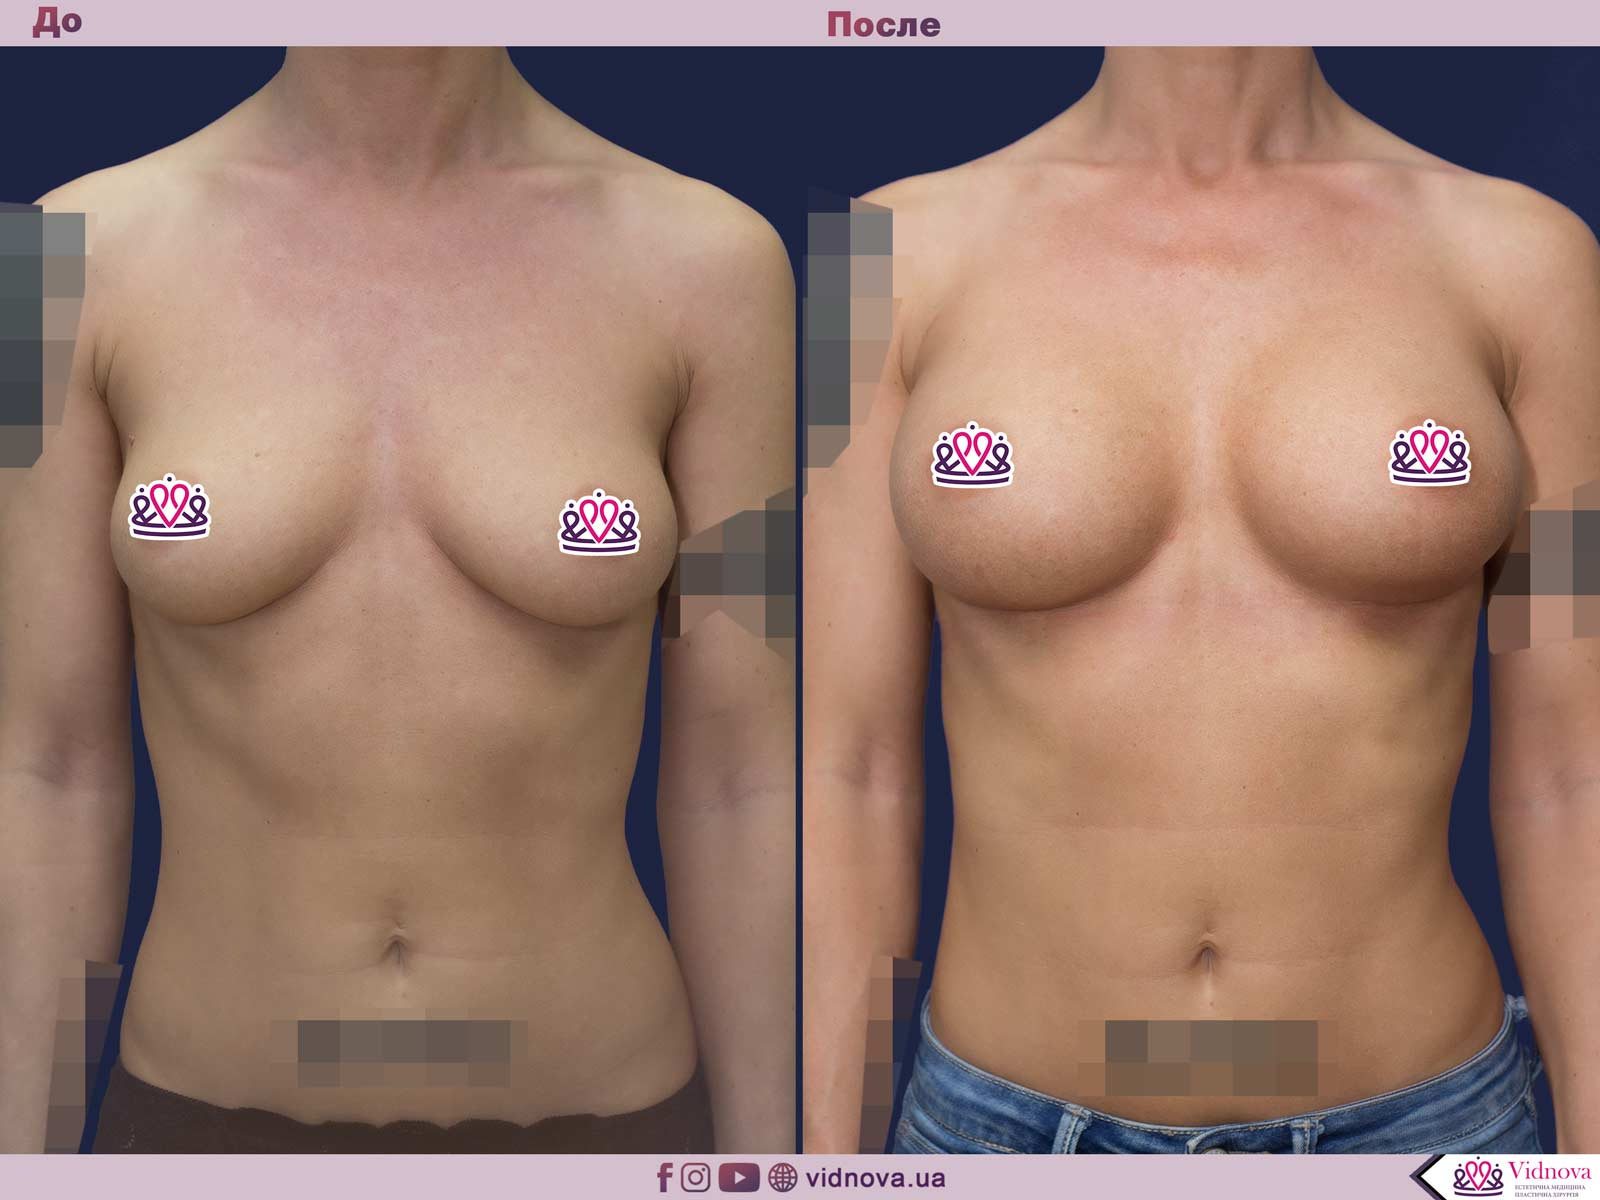 Увеличение груди: Фото ДО и ПОСЛЕ - Пример №51-1 - Клиника Vidnova